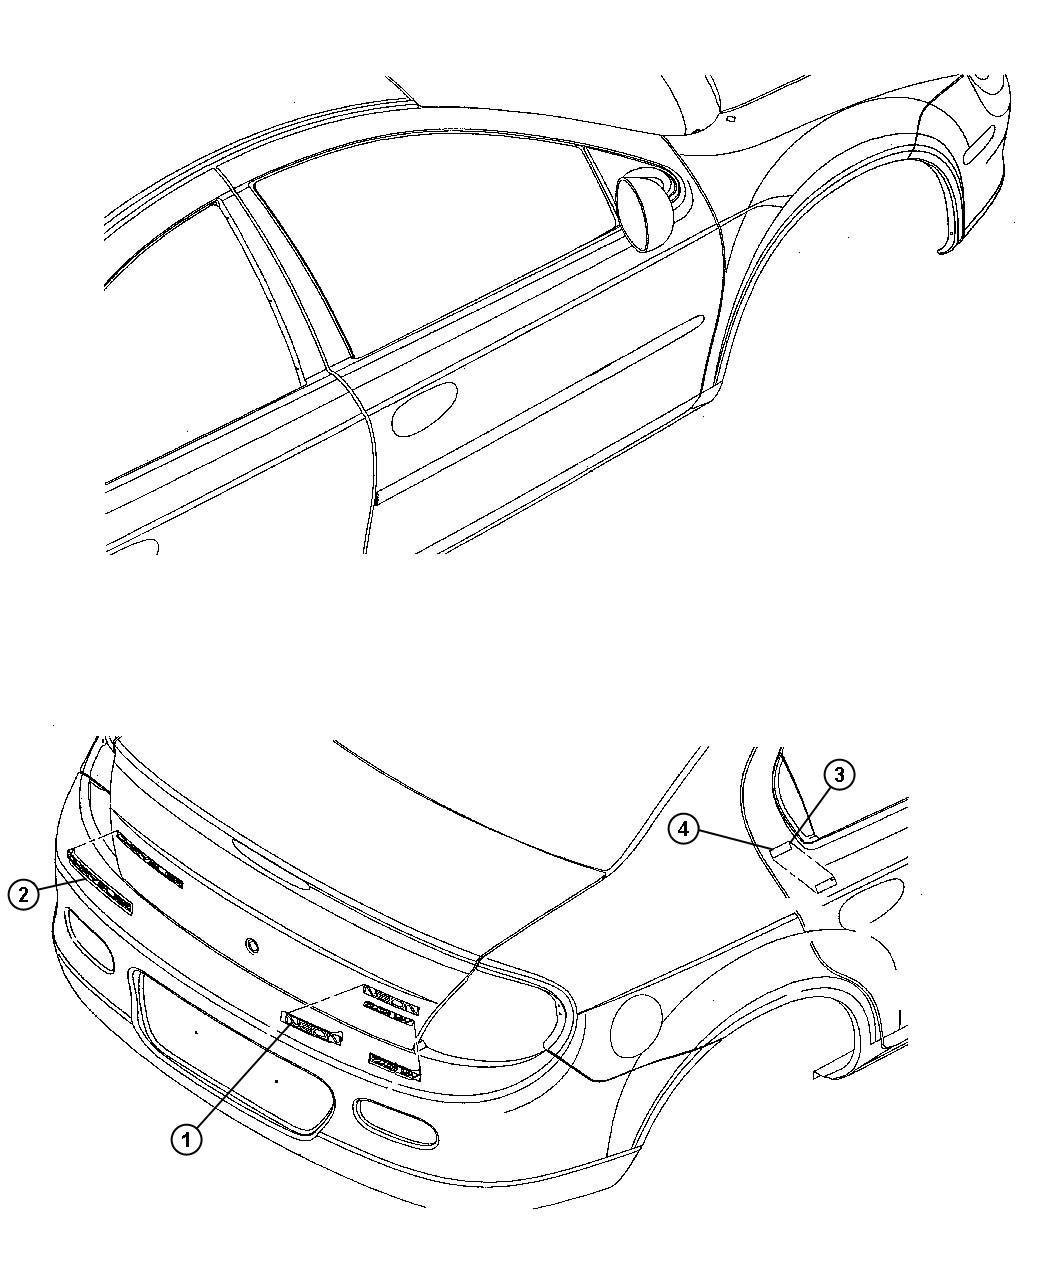 2000 Dodge Neon Nameplate. Chrysler, deck lid. [badge